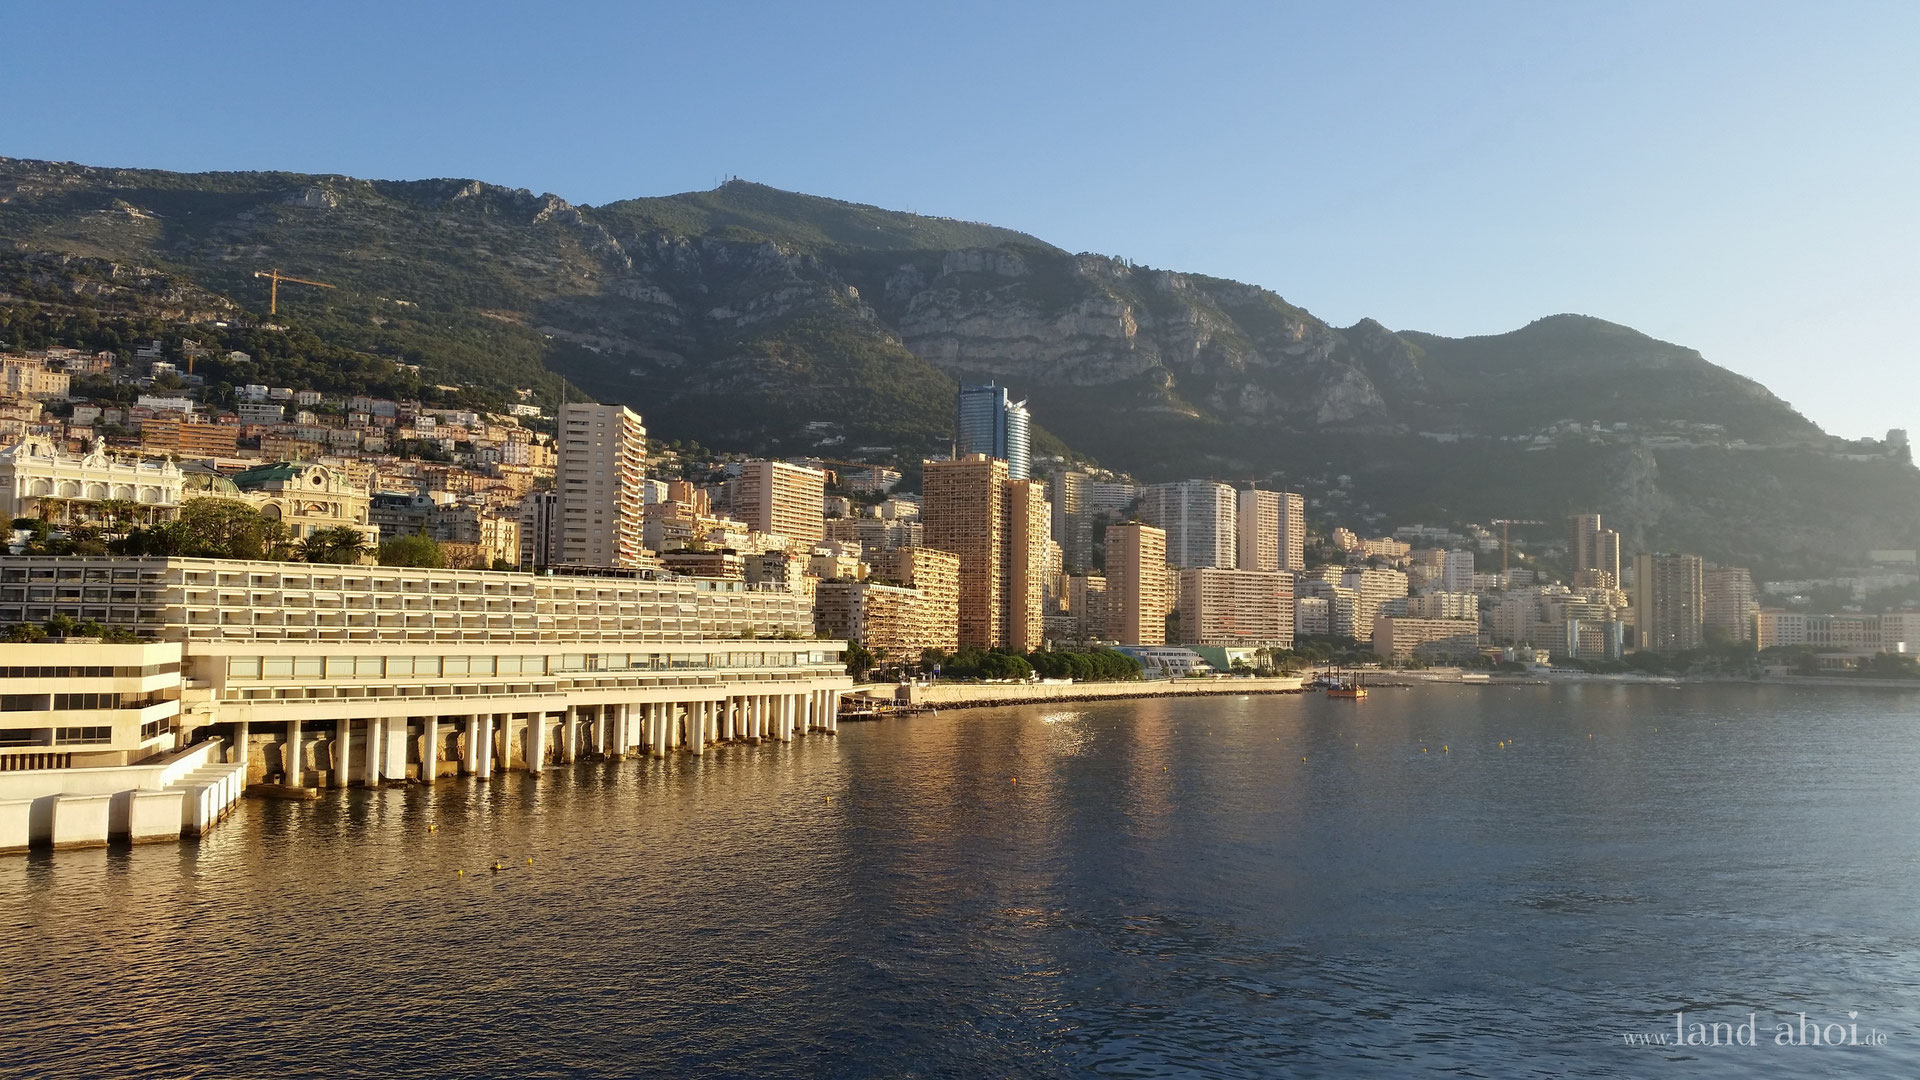 Monaco kreuzfahrt hafeninfos ausfl ge auf eigene - Europcar puerto de la cruz ...